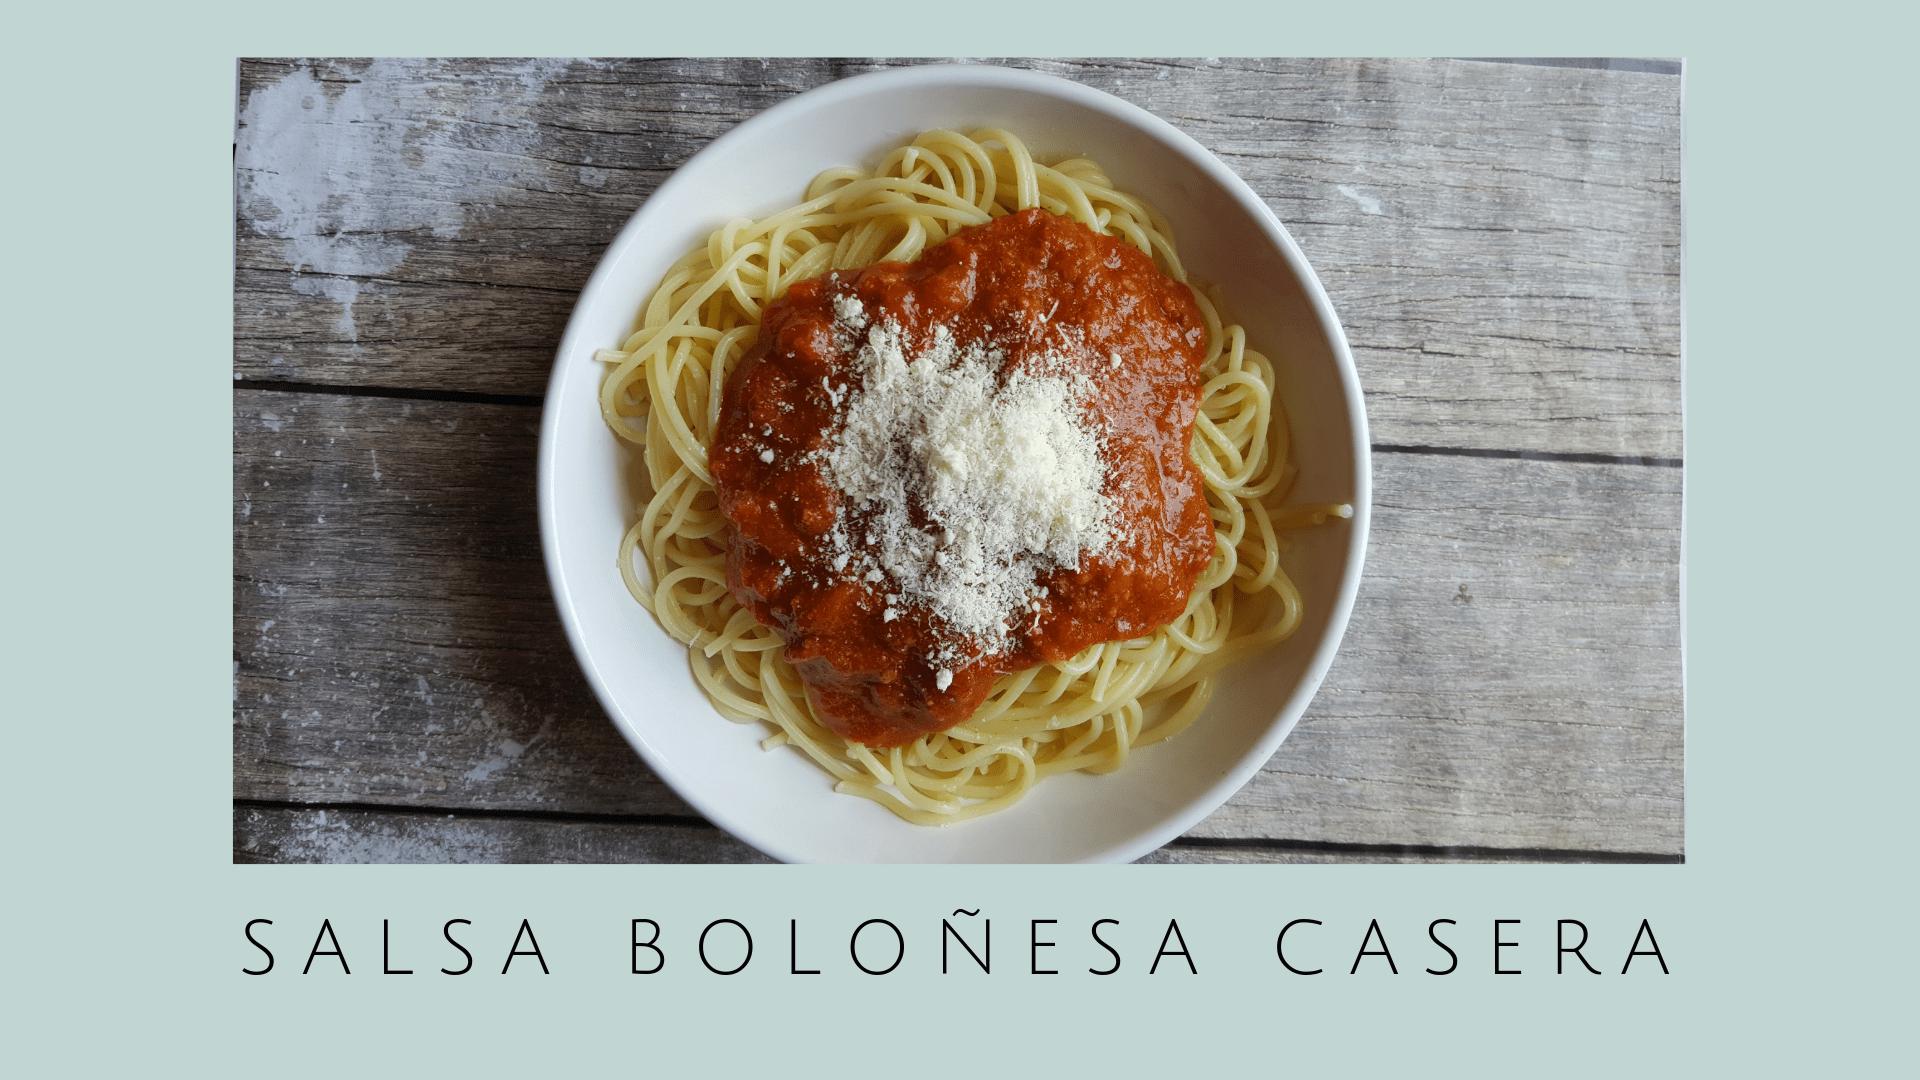 Receta de Salsa Boloñesa casera